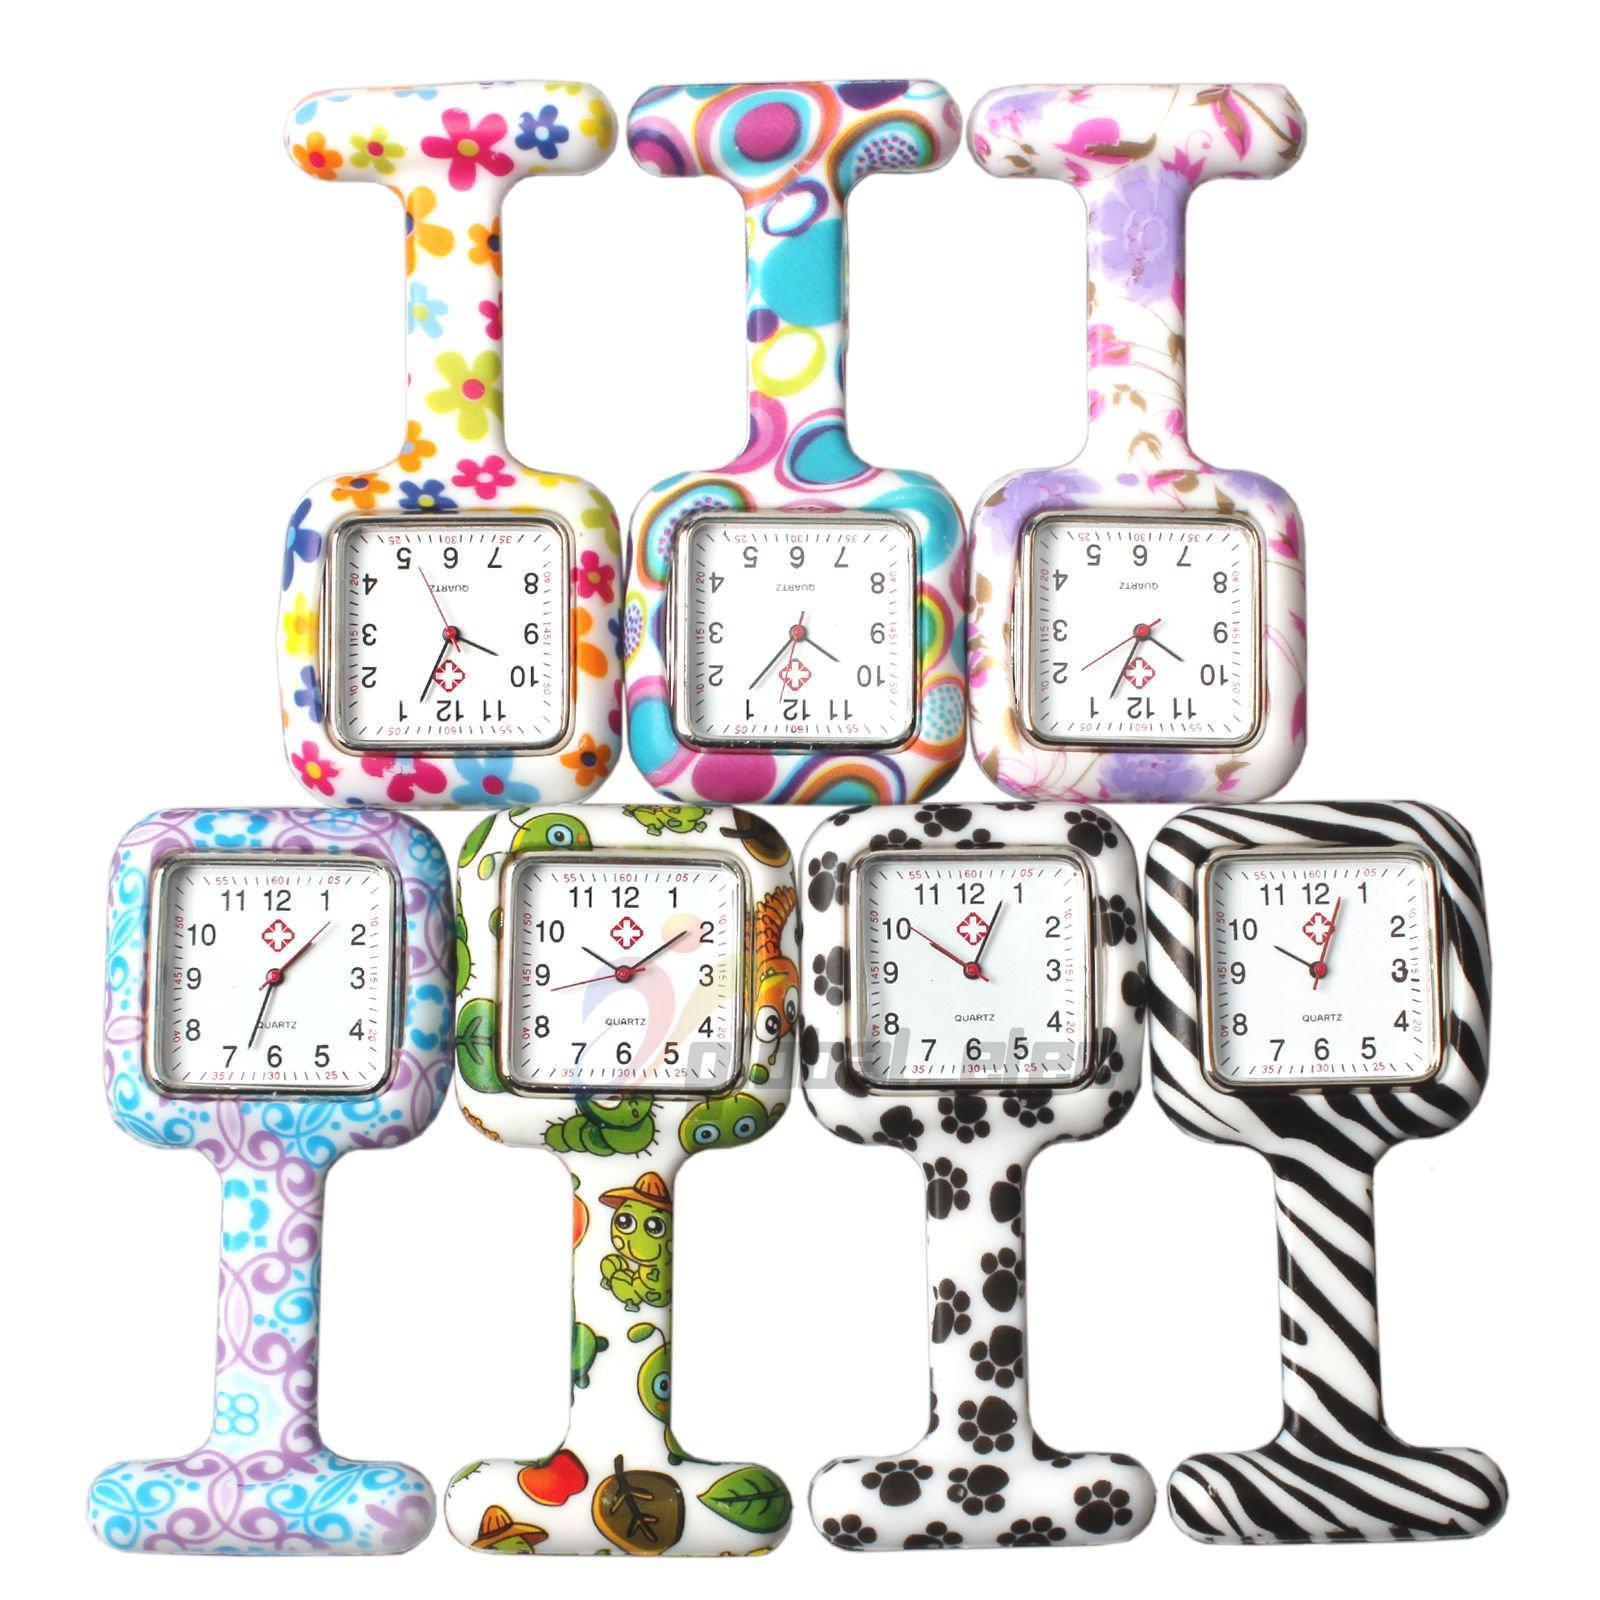 NURWAT Unisex Square Nurses Clip-on Fob Brooch Lapel Pocket Watch Silicone 7 Colors